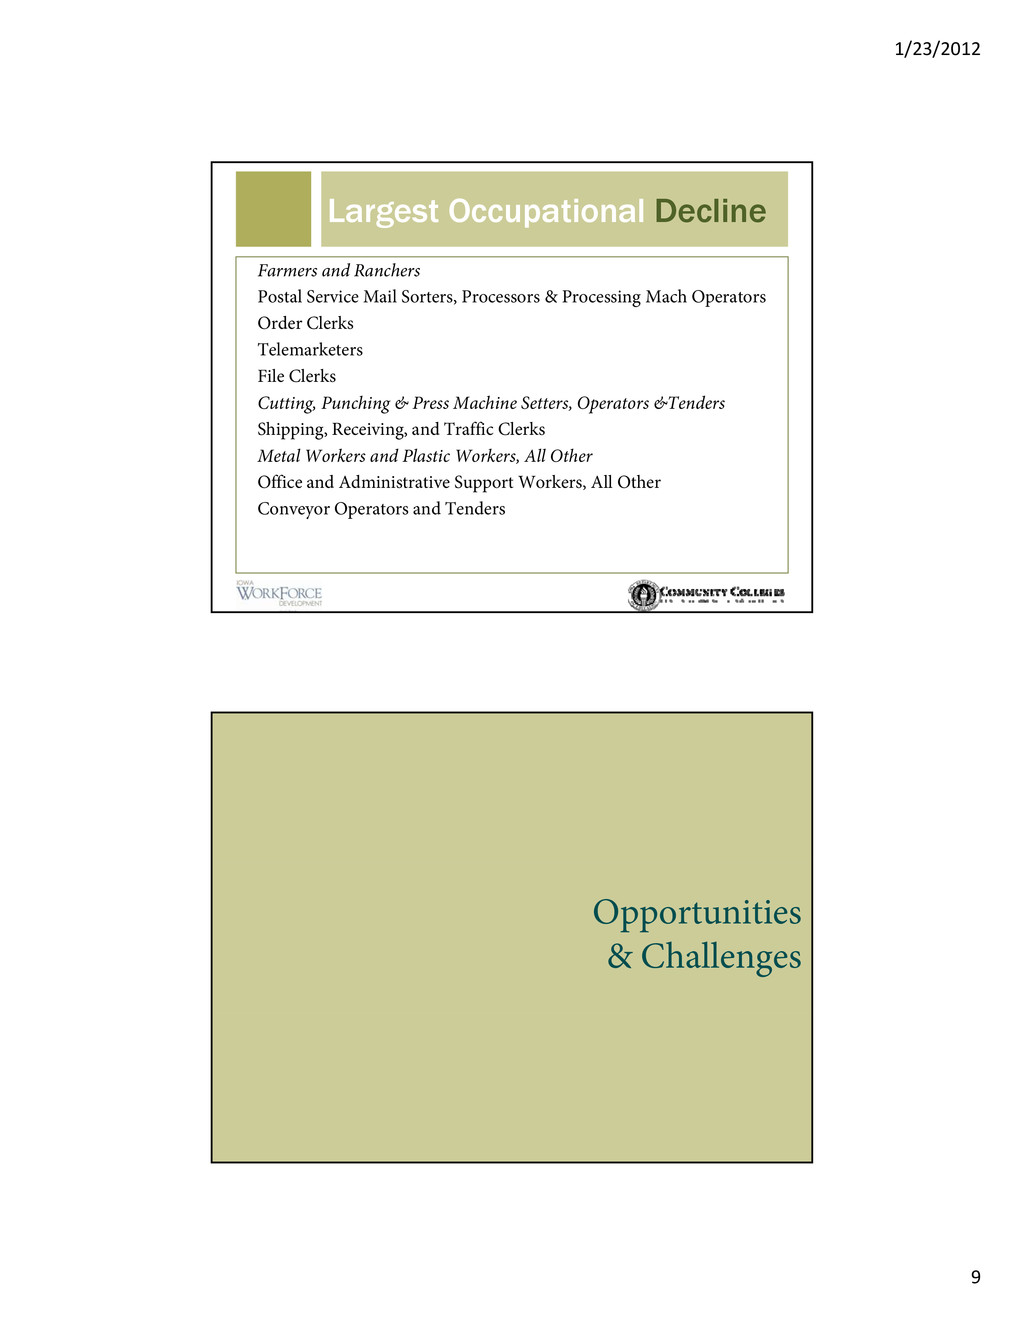 1/23/2012 9 Largest Occupational Decline Farmer...